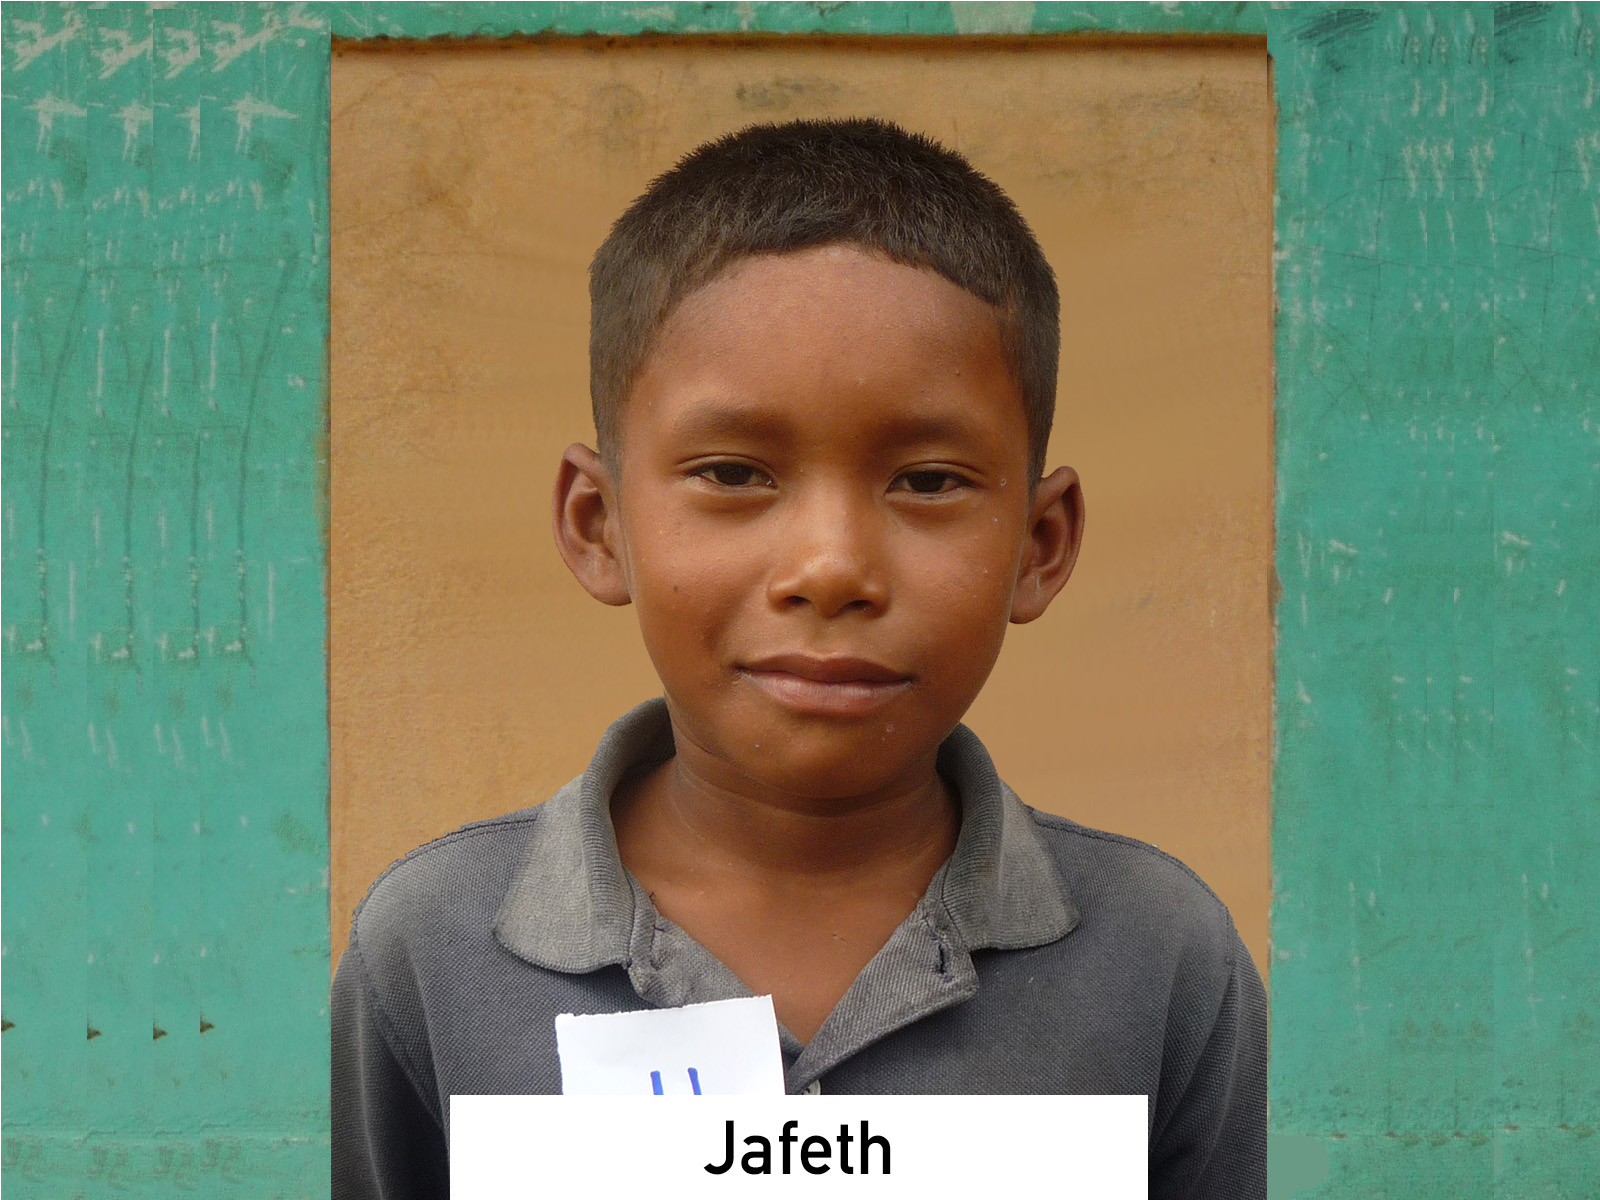 011 - Jafeth.jpg